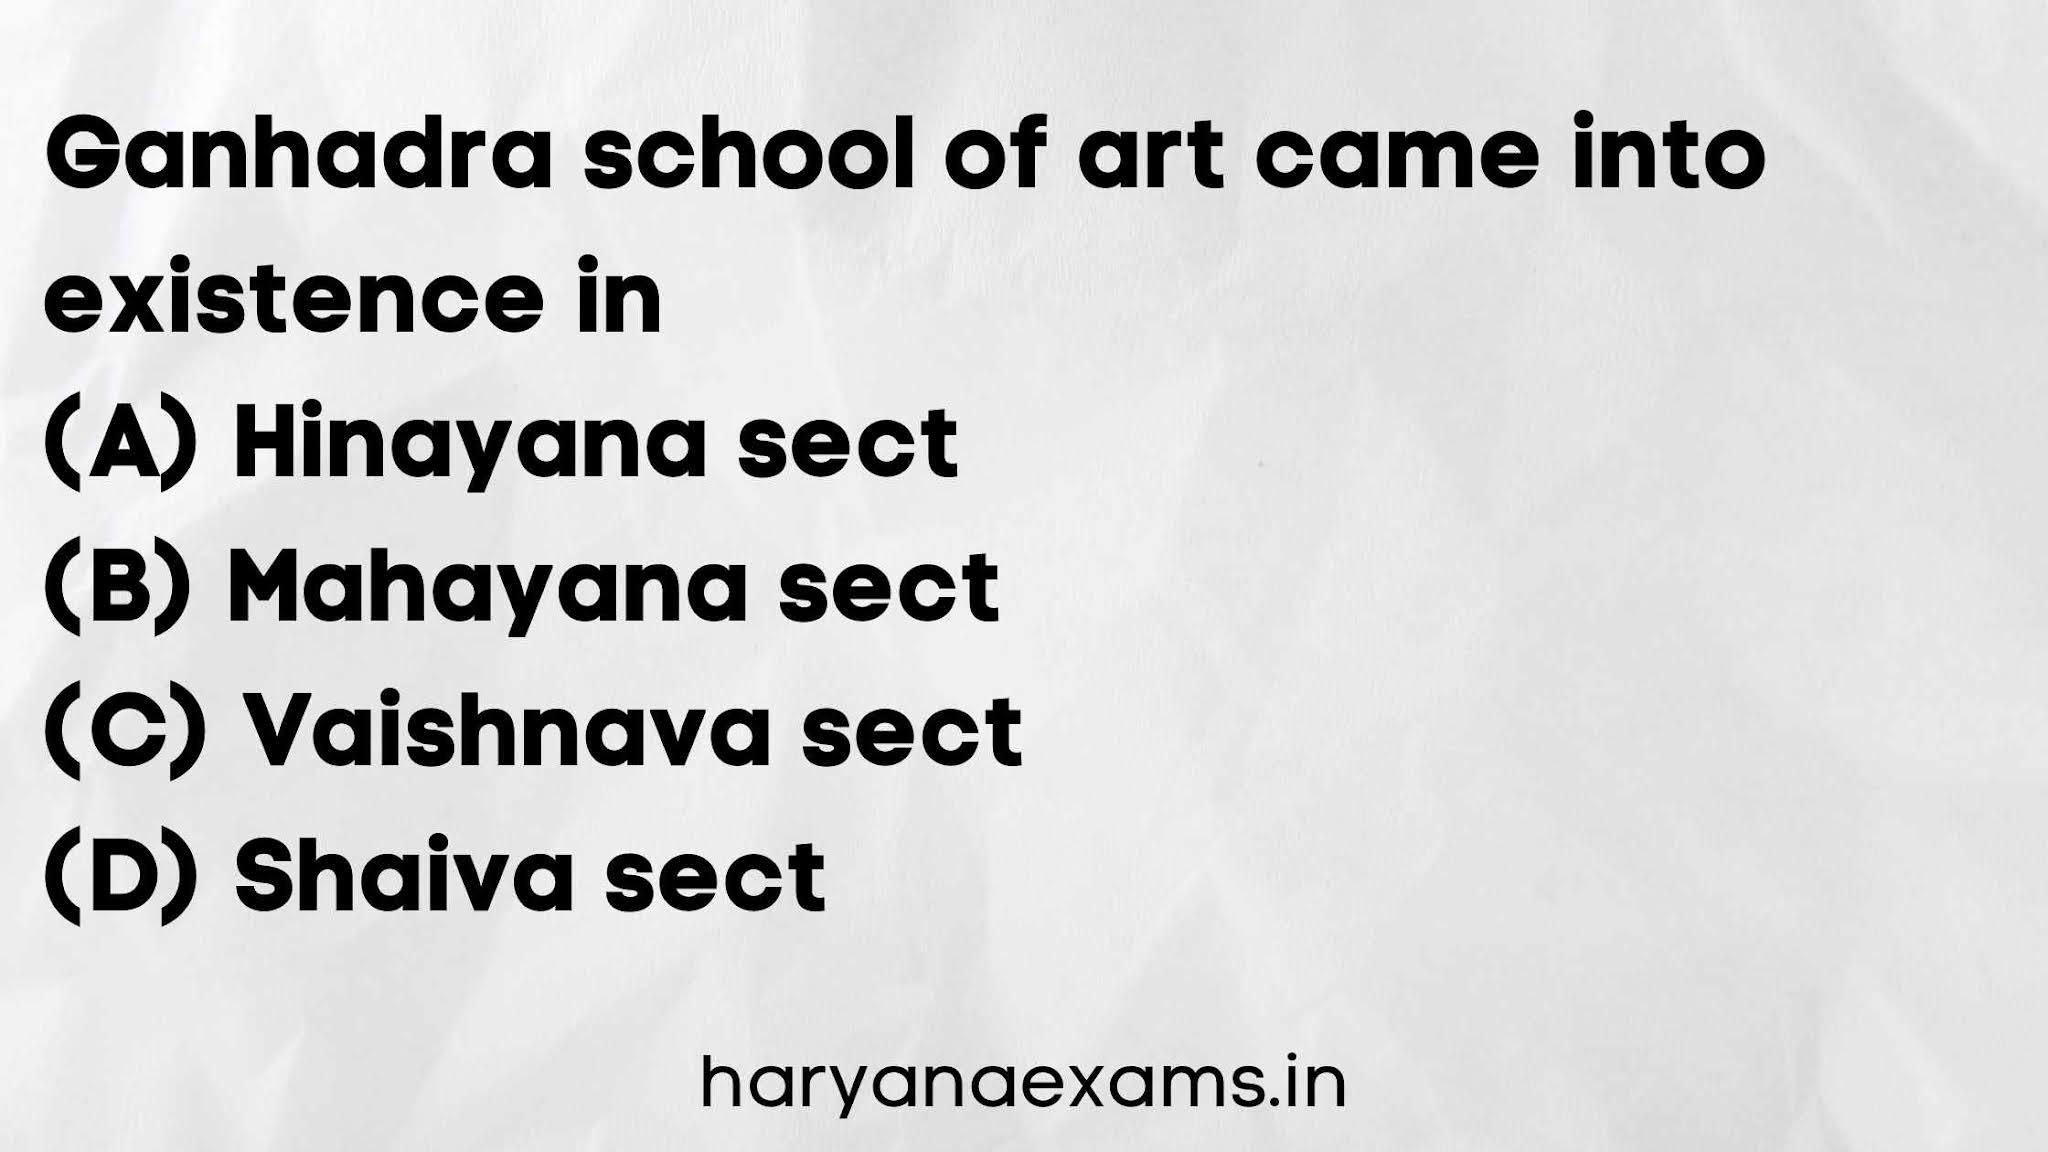 Ganhadra school of art came into existence in   (A) Hinayana sect   (B) Mahayana sect   (C) Vaishnava sect   (D) Shaiva sect